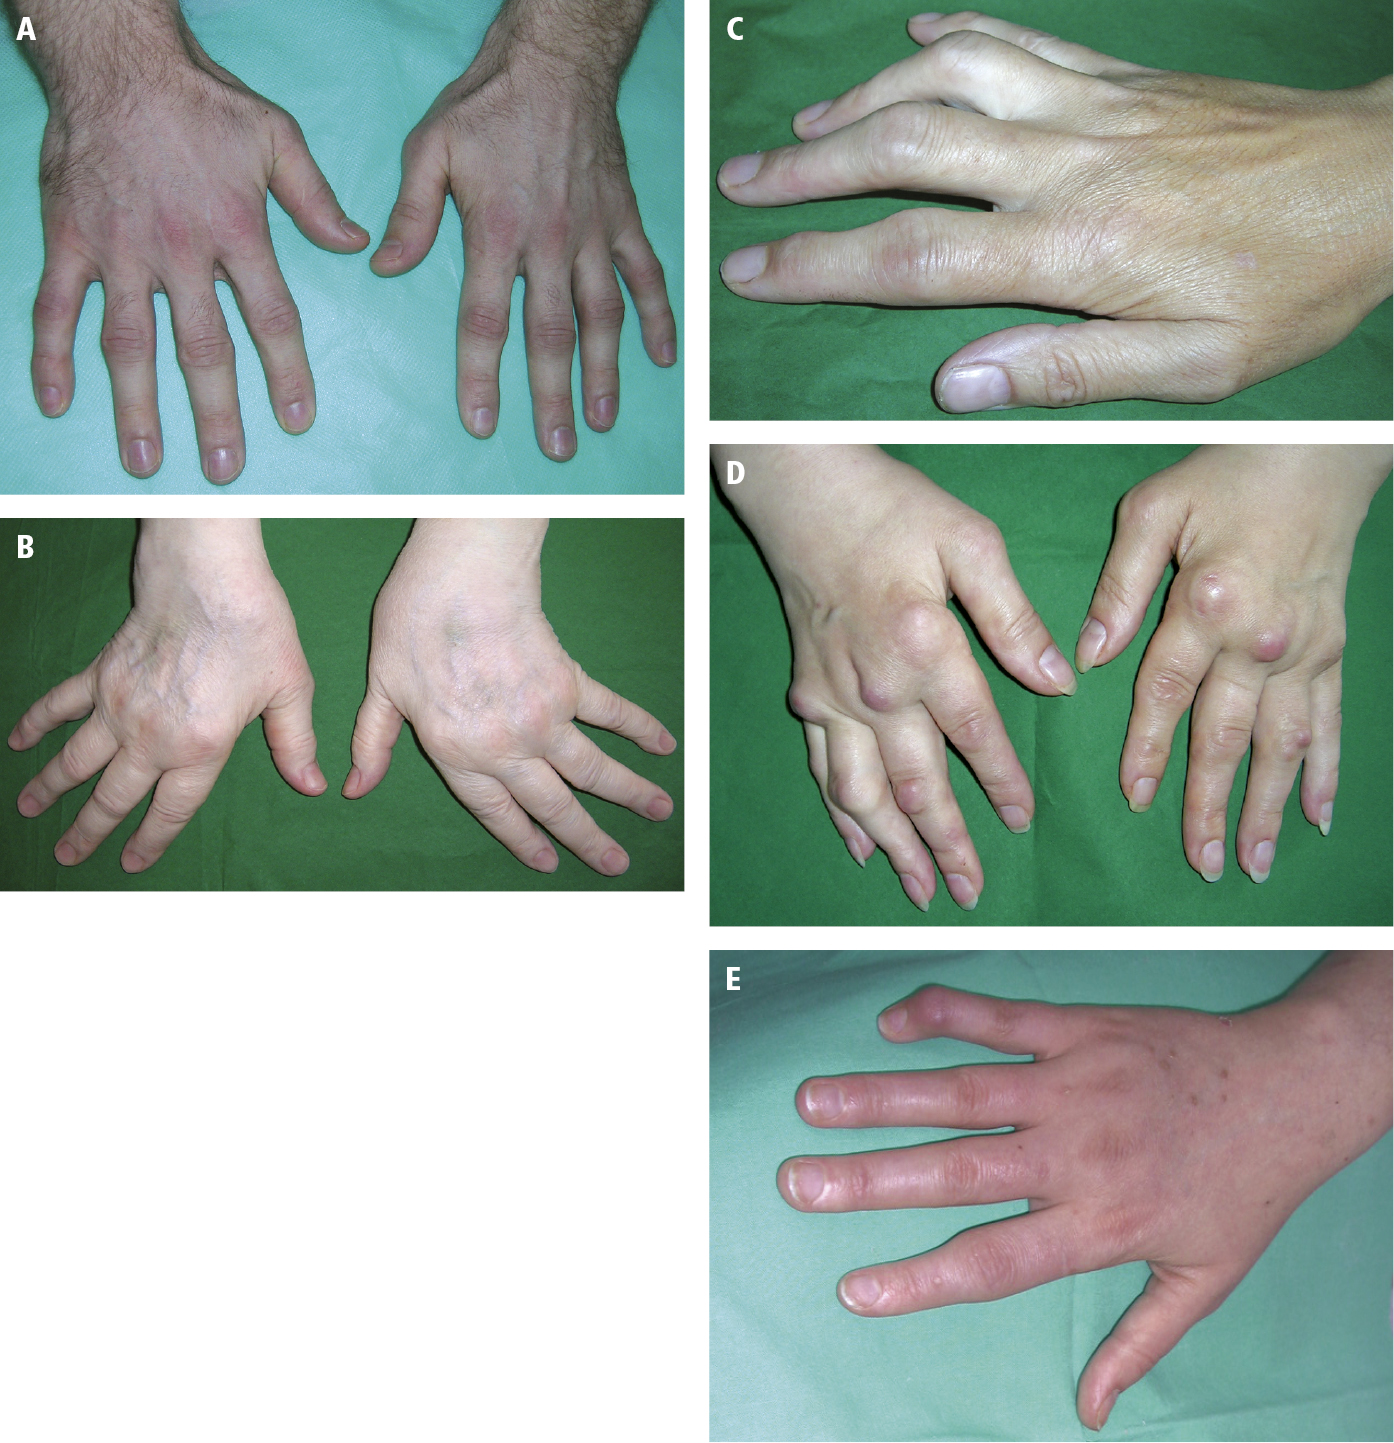 Artritis psoriásica - Espondiloartropatías - Enfermedades reumáticas ...